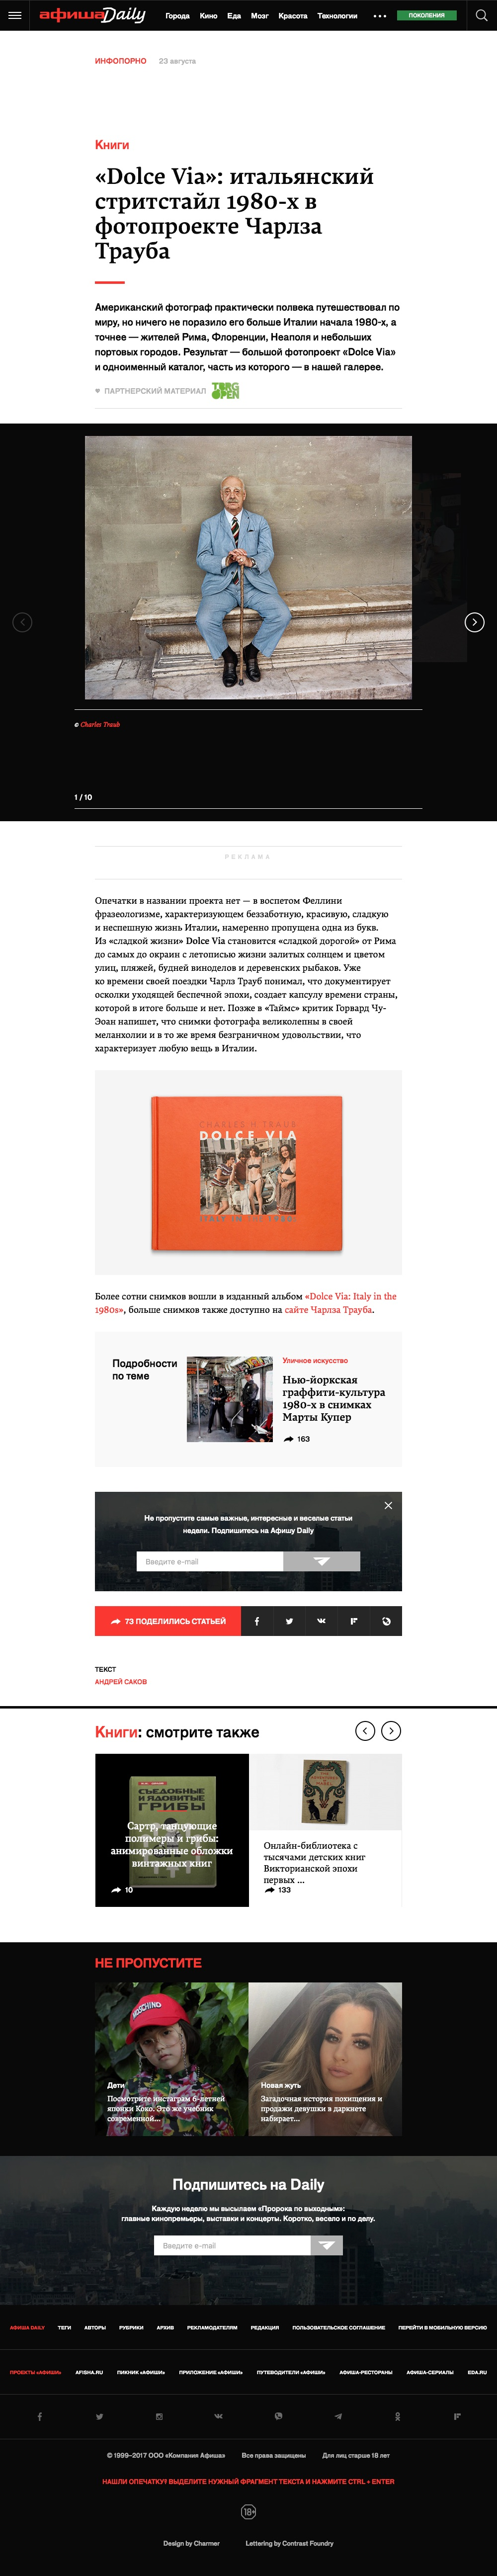 20170823 - Dolce Via - Afisha RU - «Dolce Via»-итальянский стритстайл 1980-х в фотопроекте Чарлза Трауба (2017-08-29 14-11-46).jpg